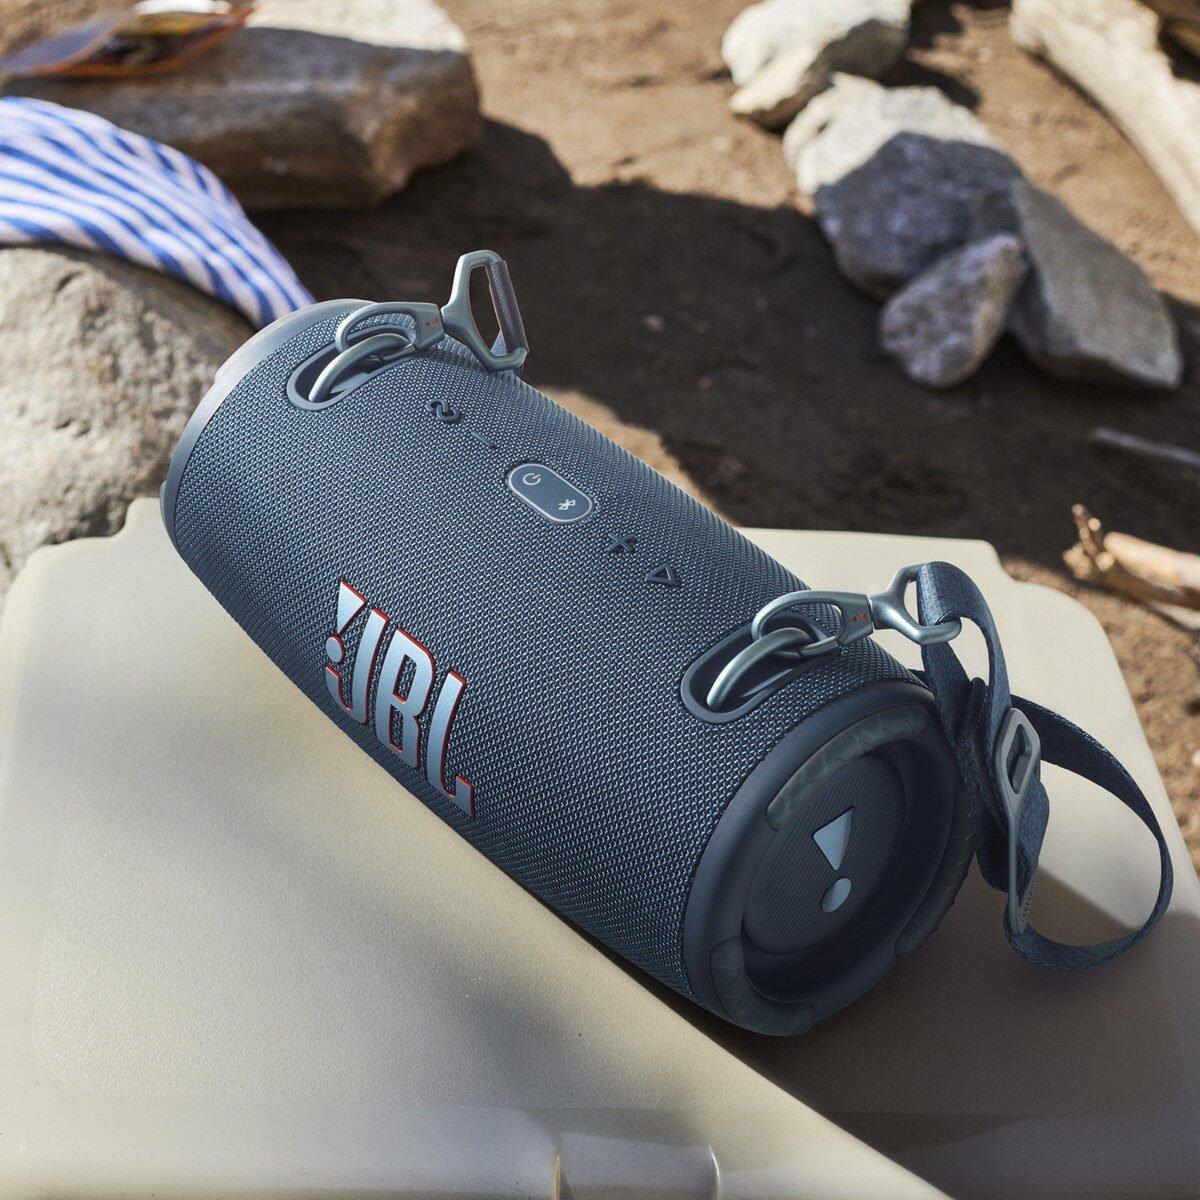 jbl xtreme 3 portable bluetooth waterproof speaker black jblxtreme3blkas lifestyle blue 2e4c7c42 high